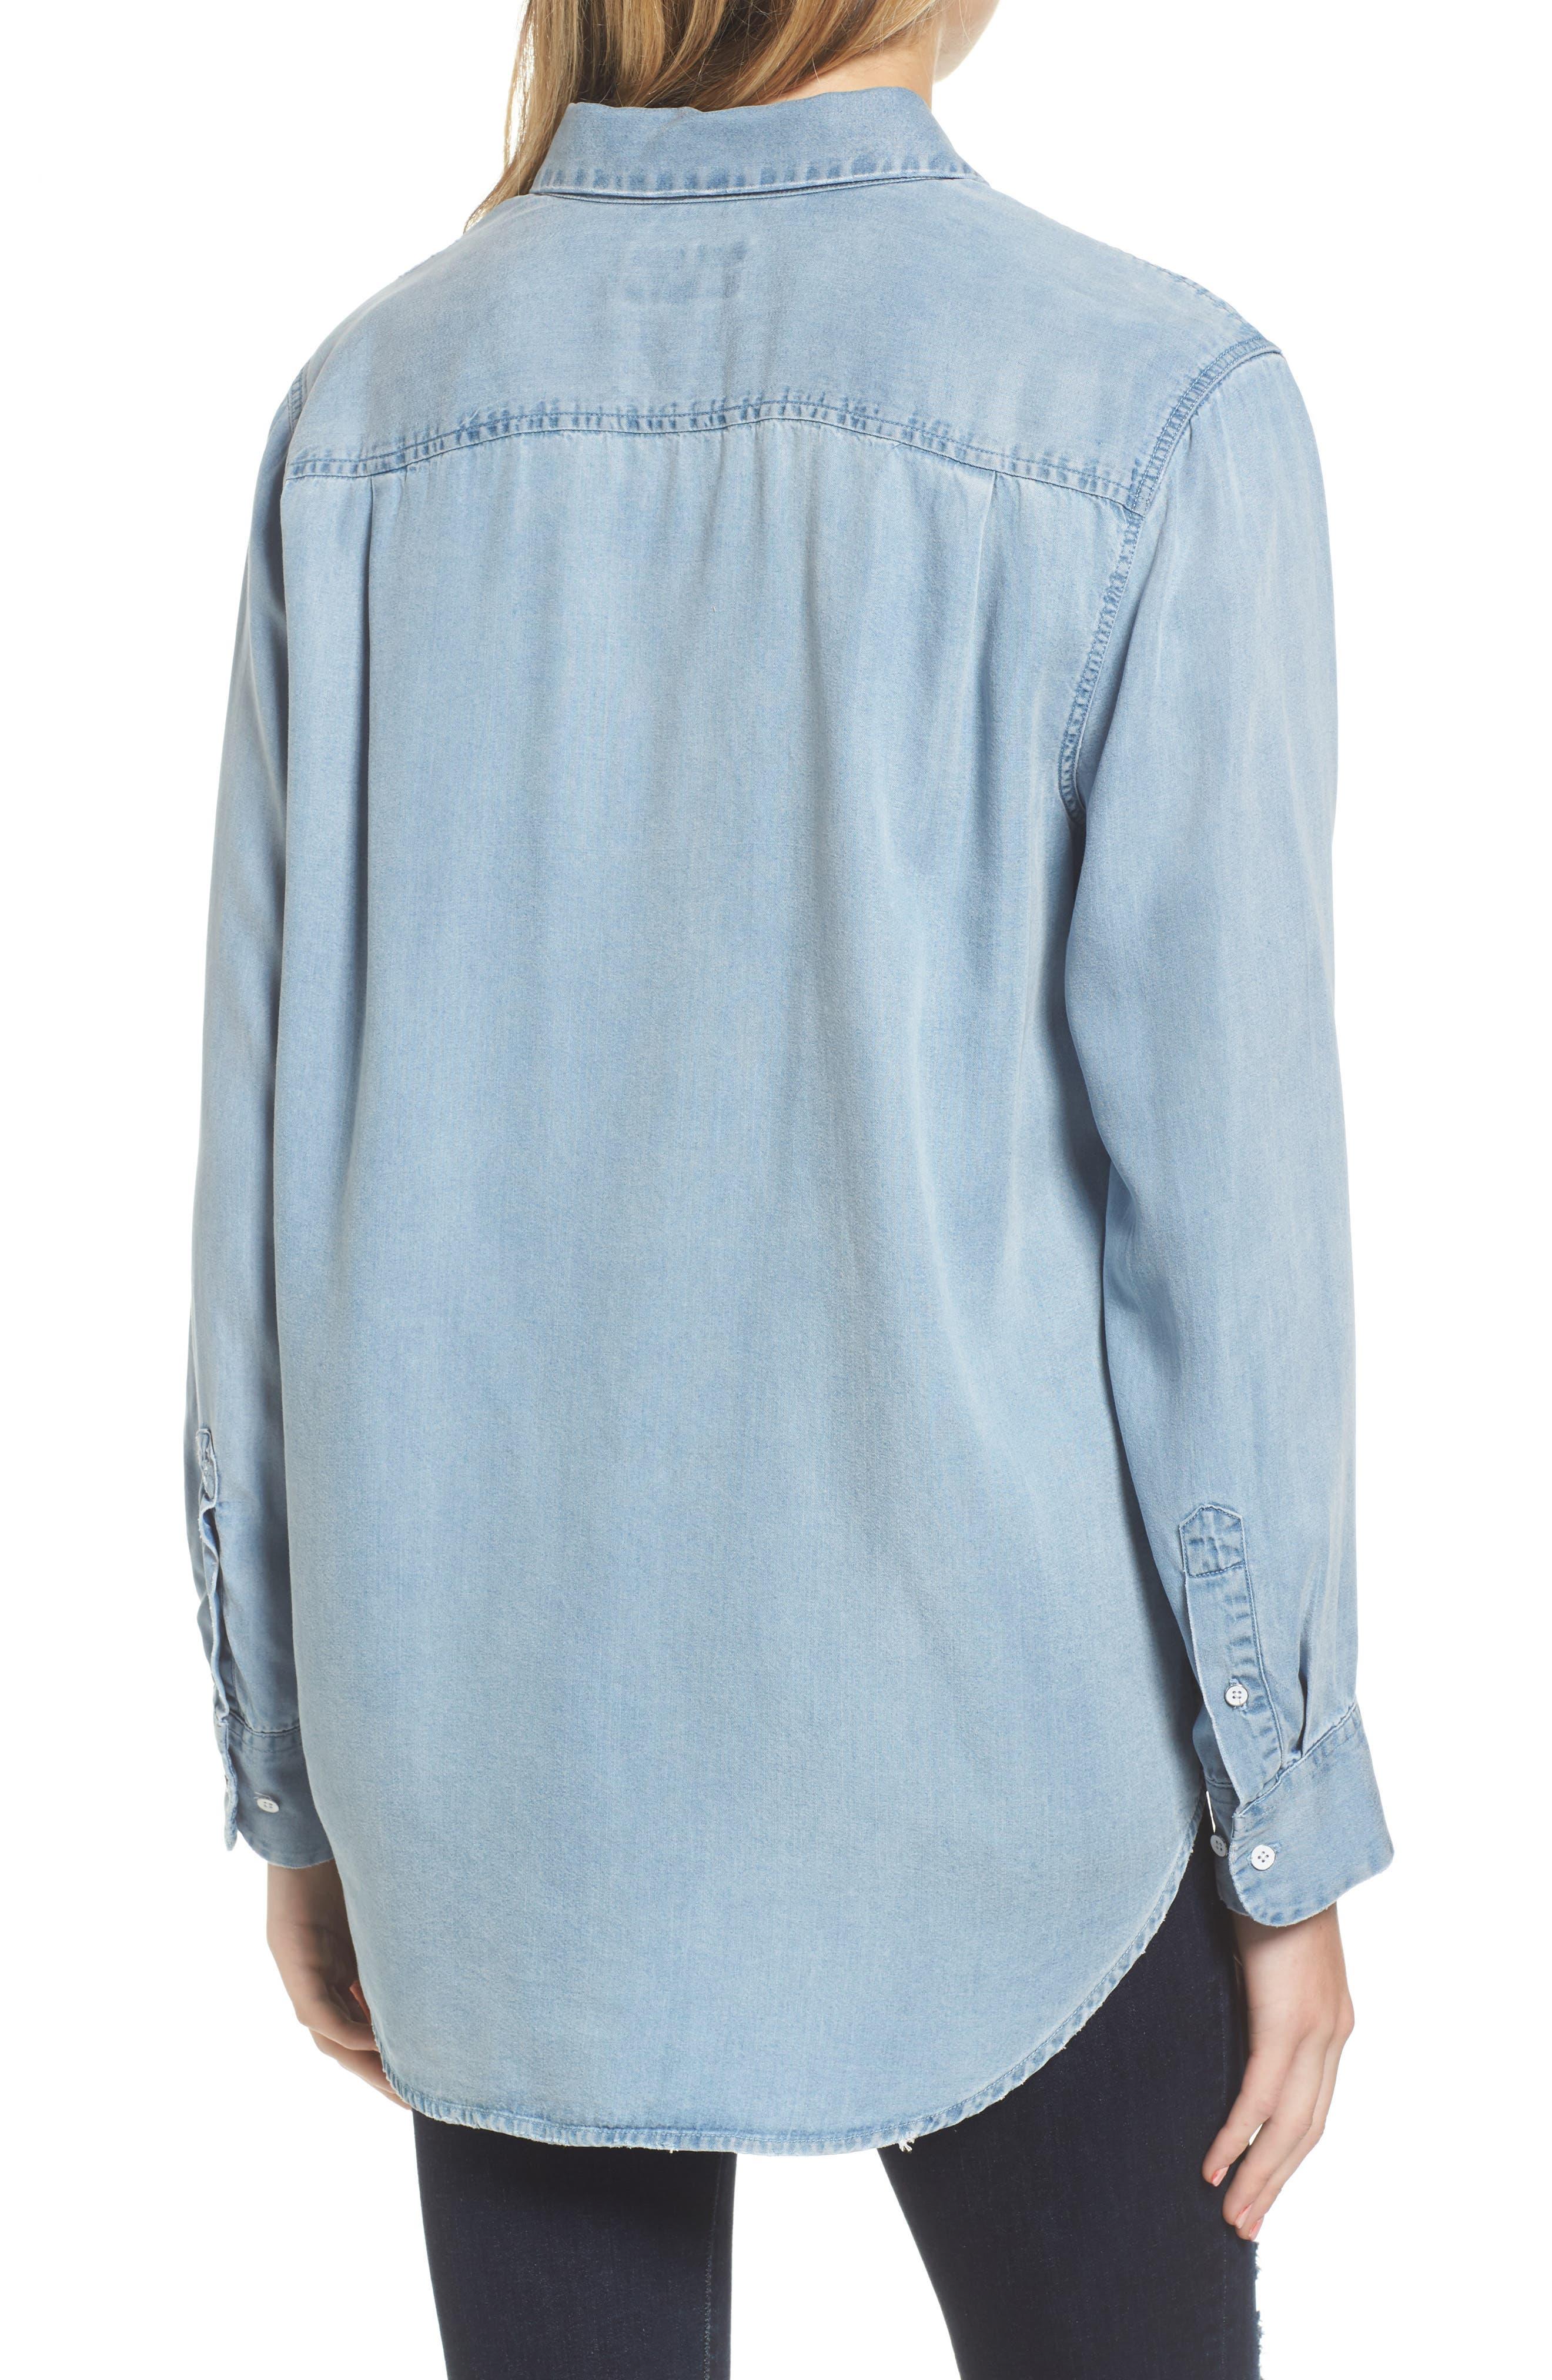 x The Blue Shirt Shop Nassau & Manhattan Boyfriend Shirt,                             Alternate thumbnail 2, color,